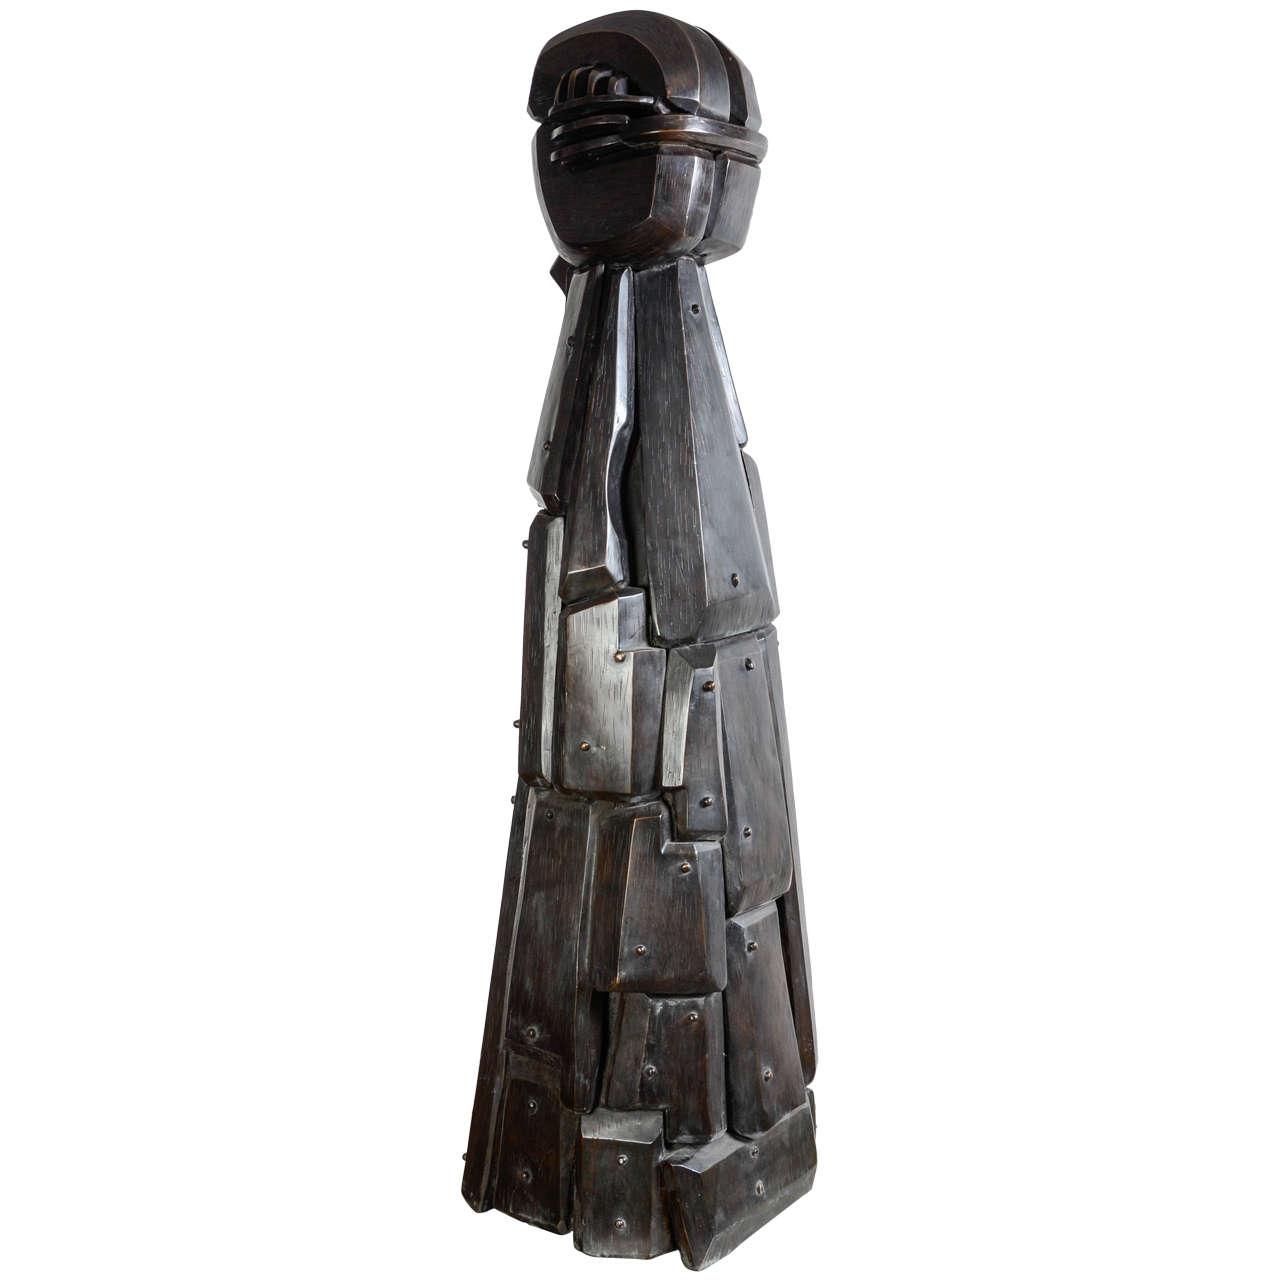 Menina Sculpture by J.Subira-Puig